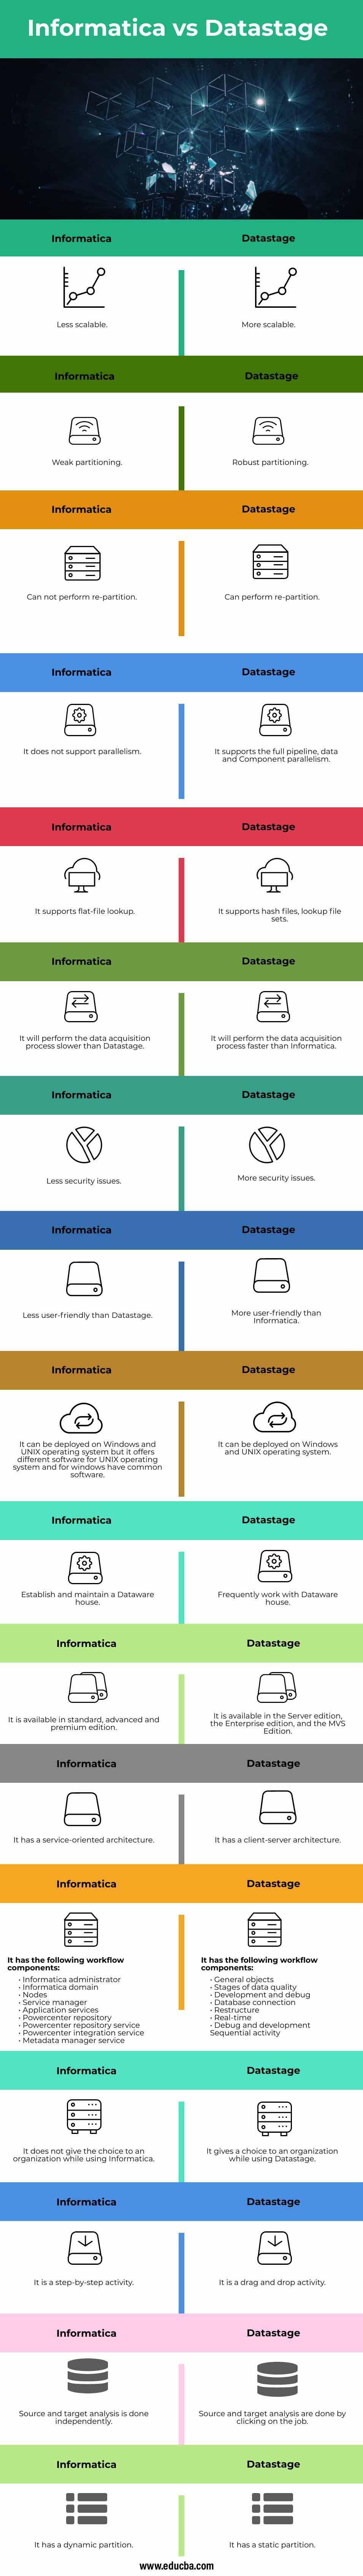 Informatica-vs-Datastage-info